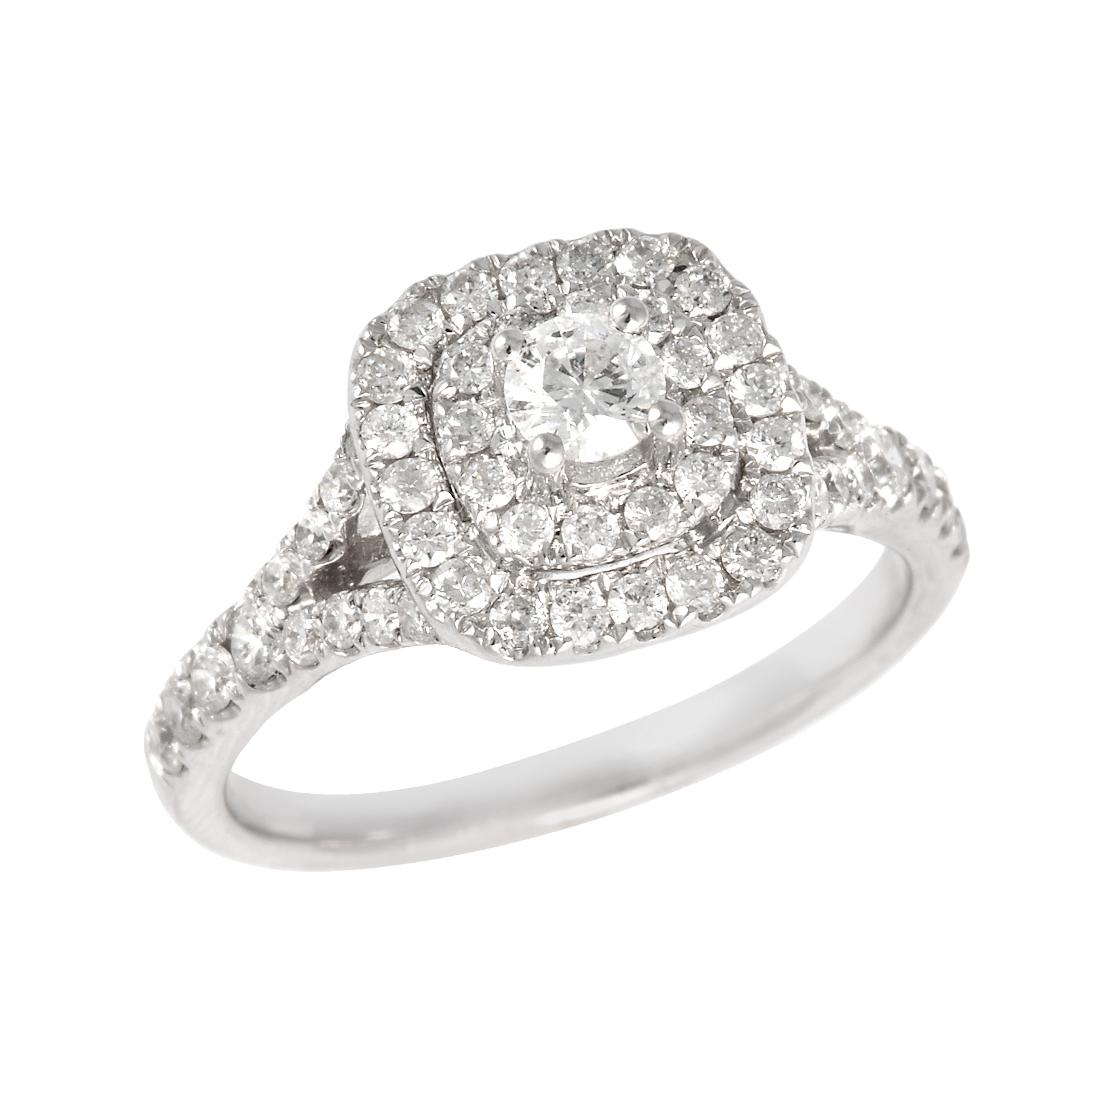 Double Diamond Halo Engagement Ring